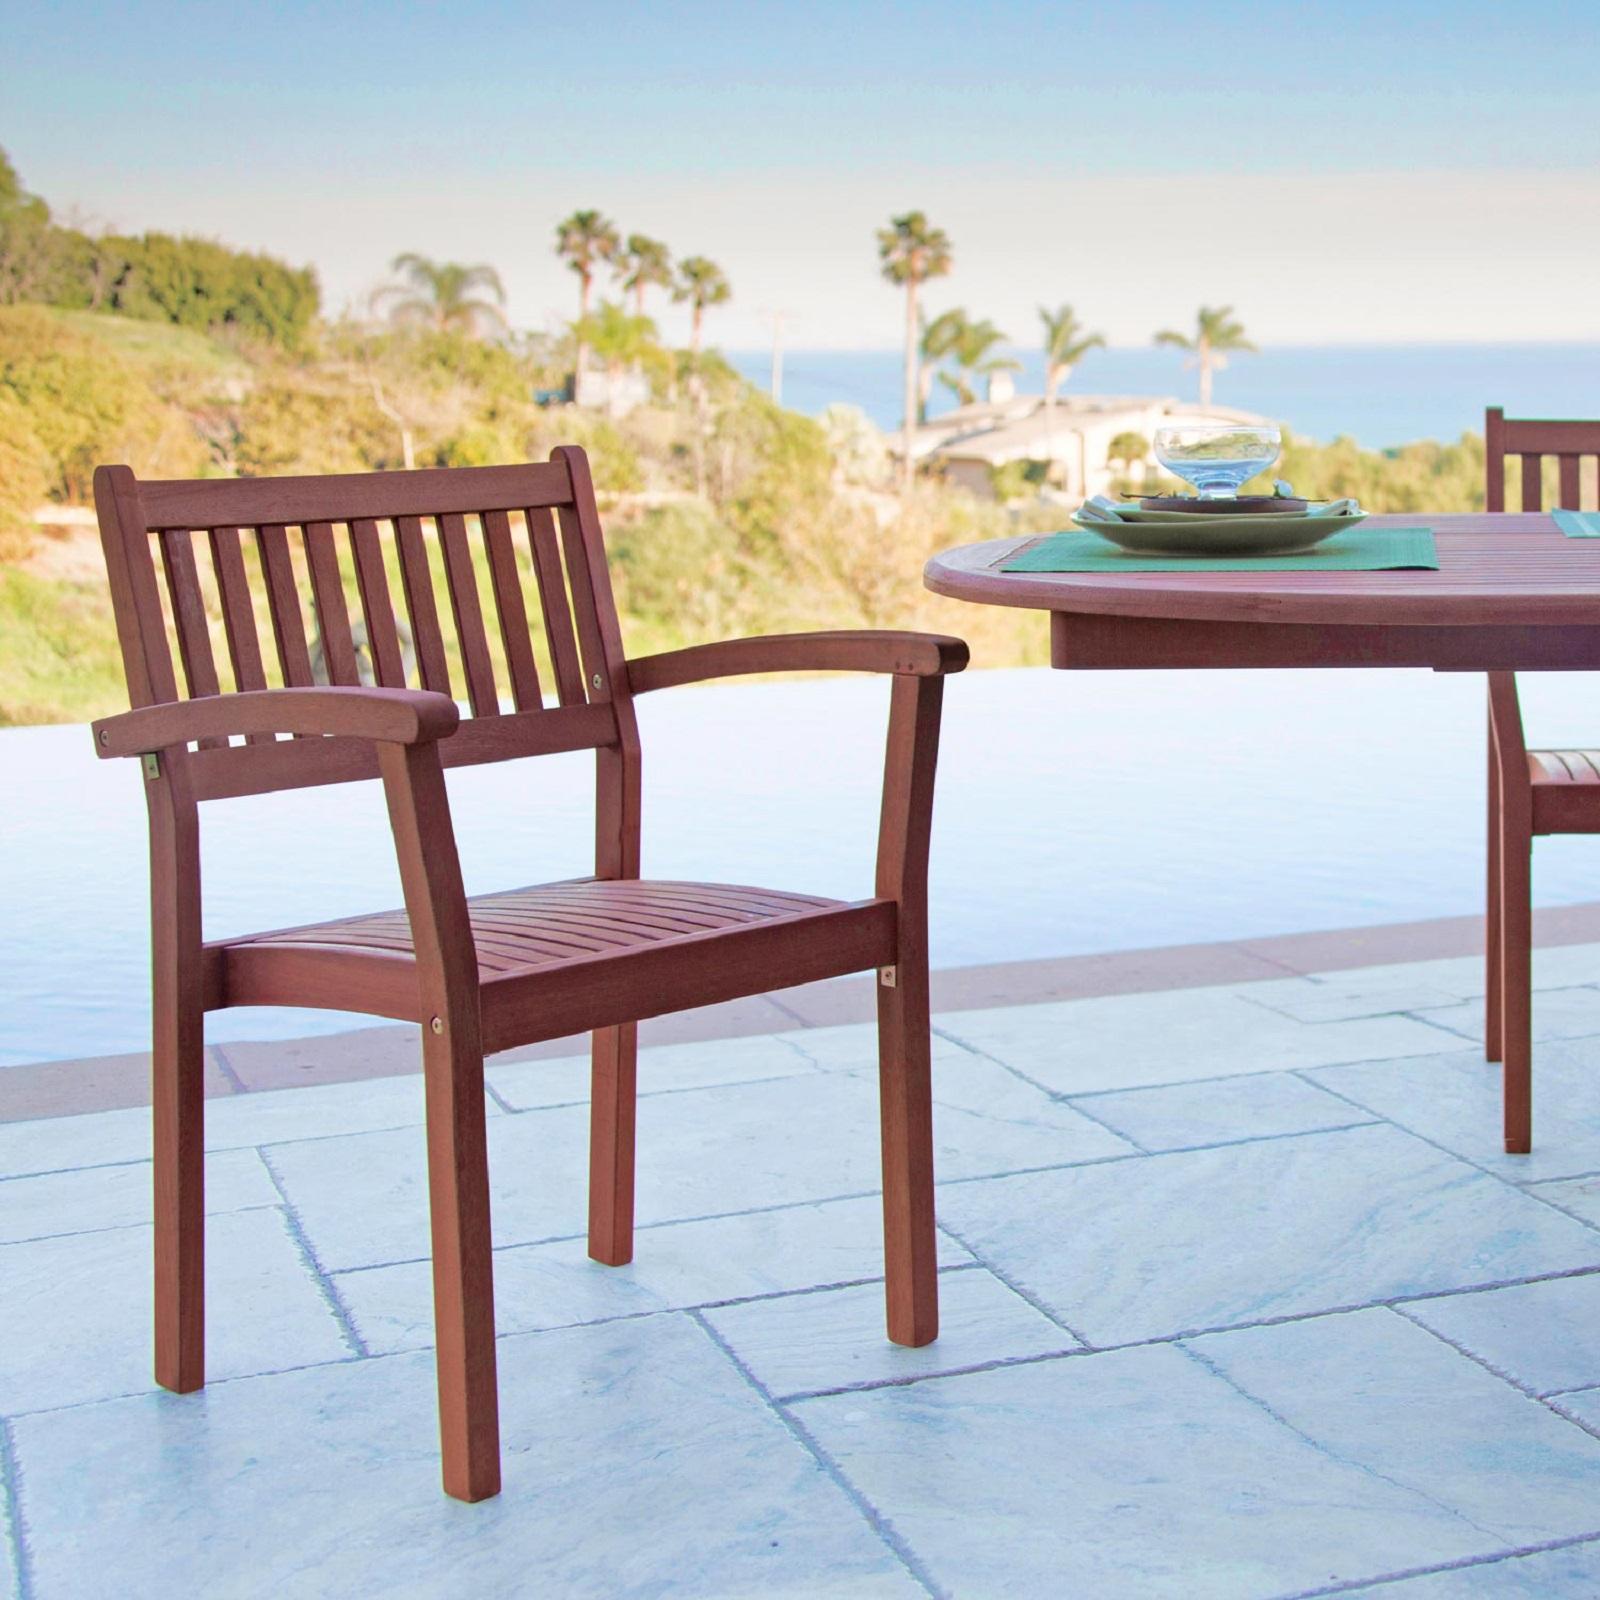 Malibu Outdoor Garden Stacking Armchair (Set of 2)